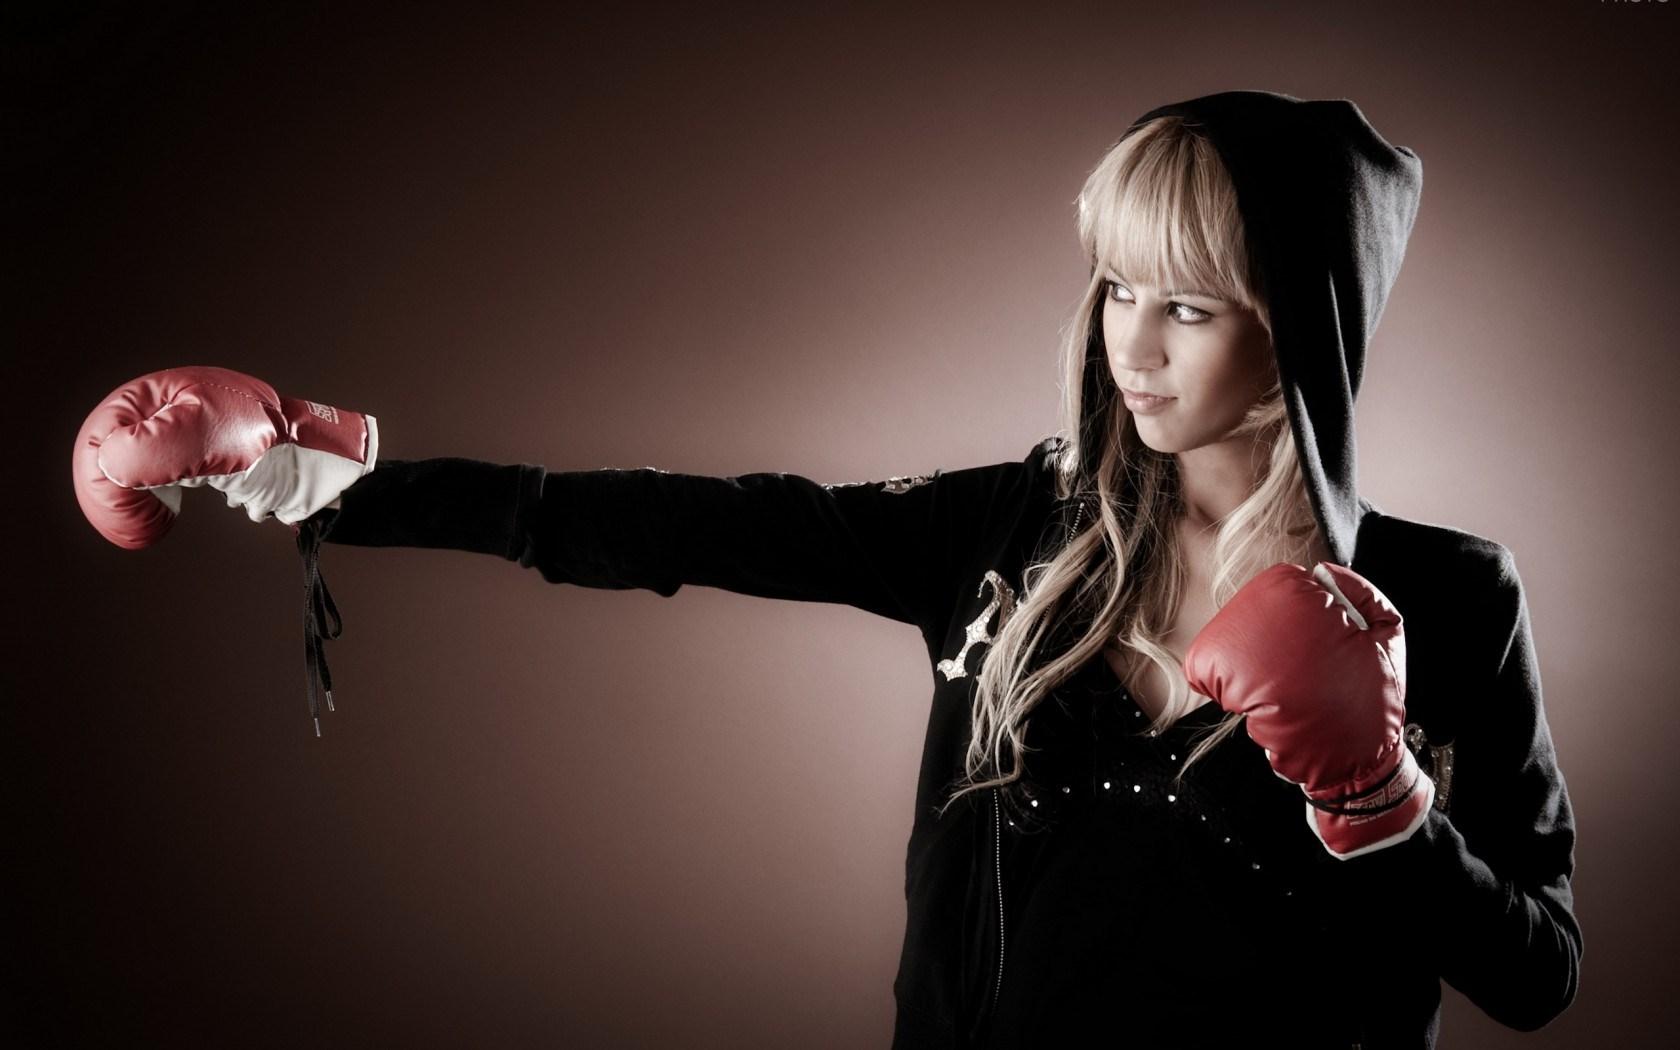 Blonde Girl Boxing Gloves HD Wallpaper